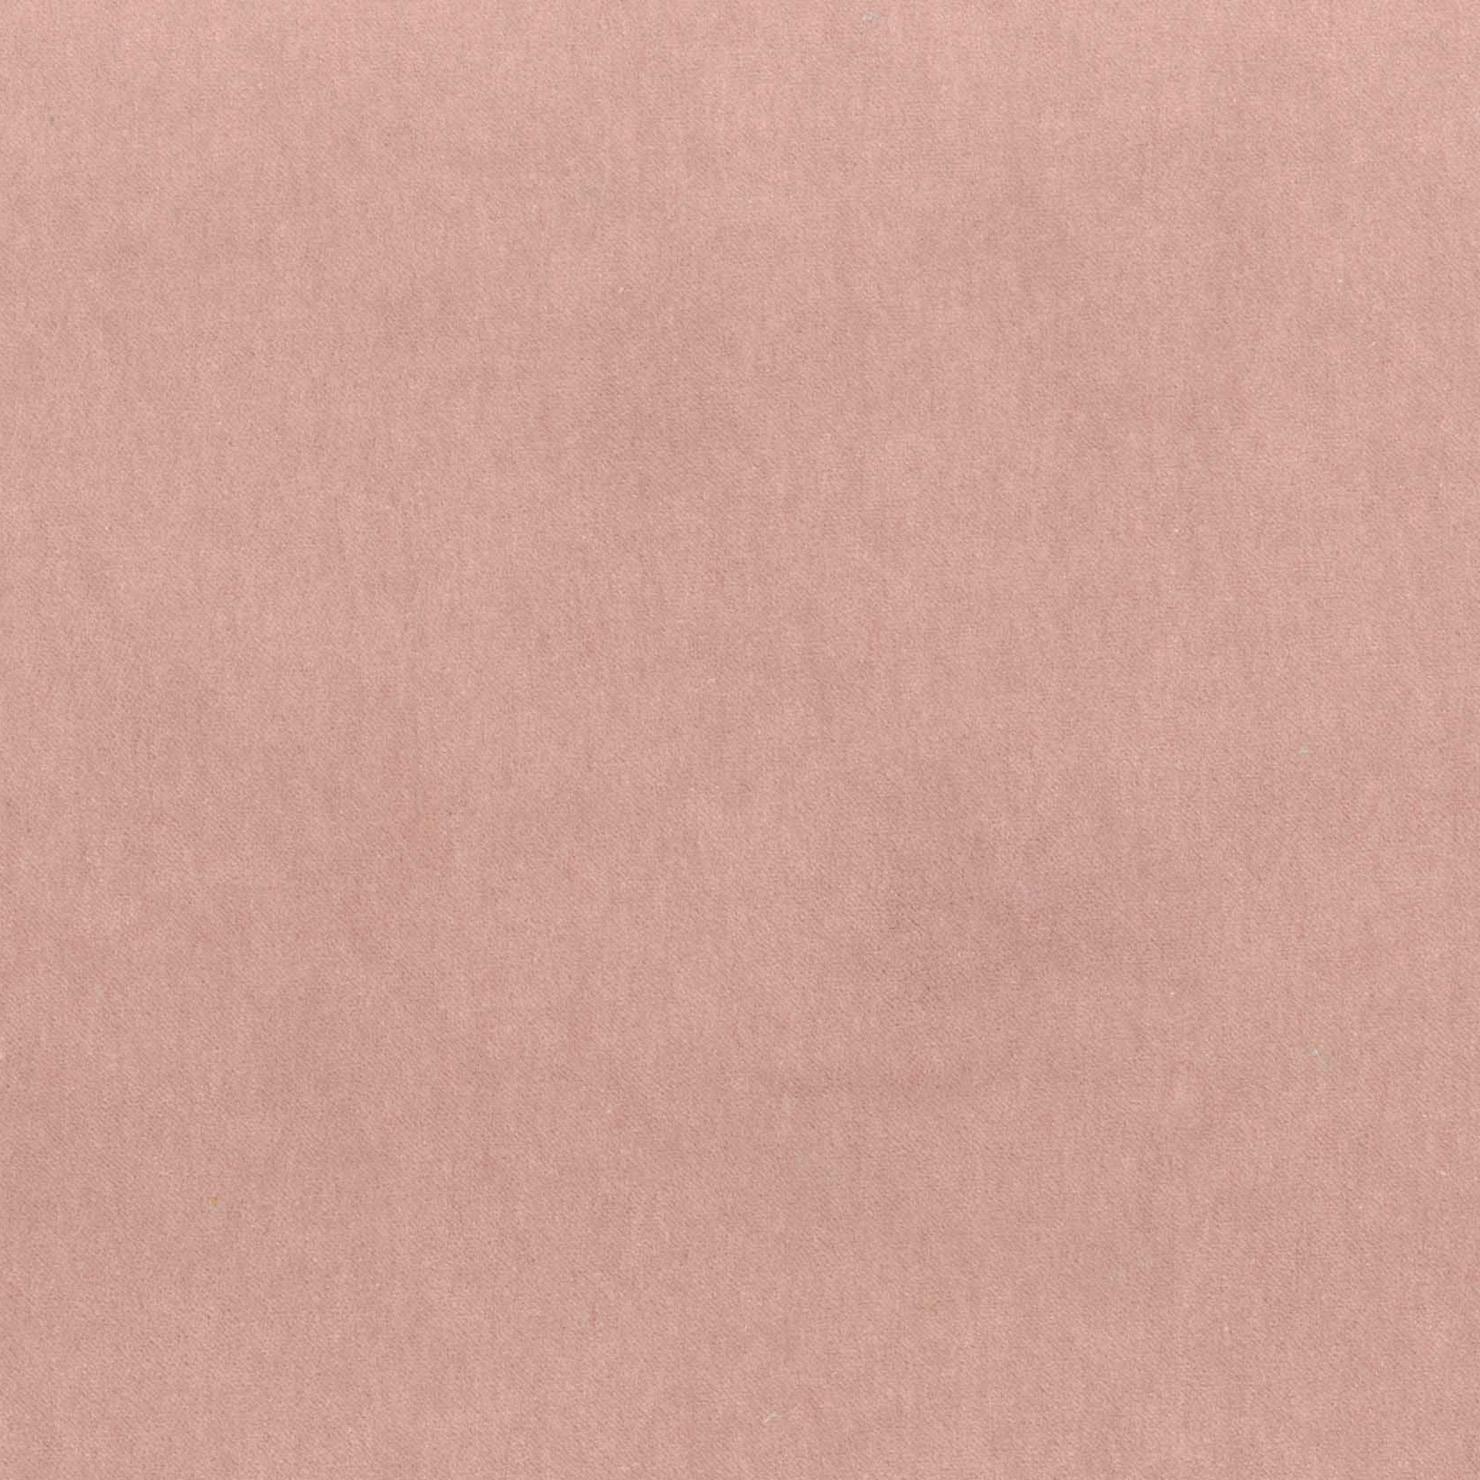 4 Malibu velvet pwdr pink